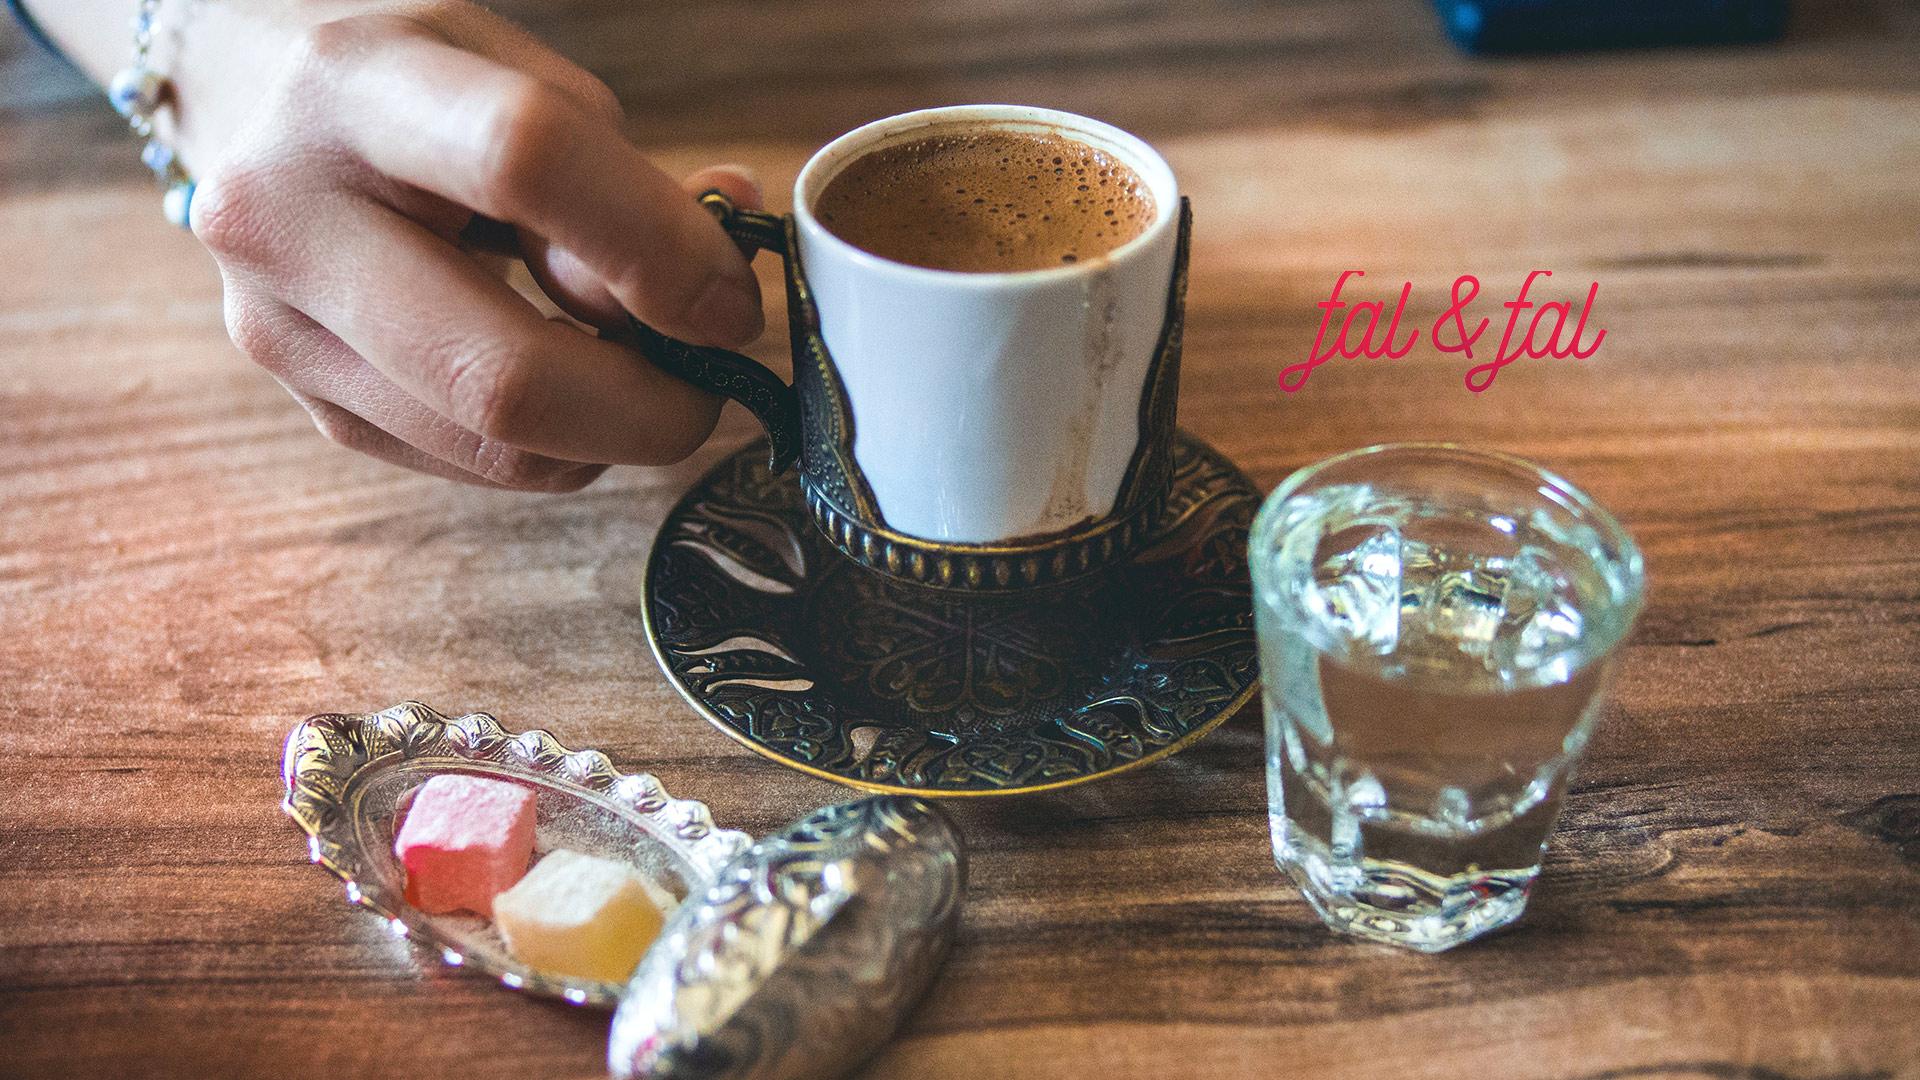 gercek-falcilarla-kahve-fali-baktirmak